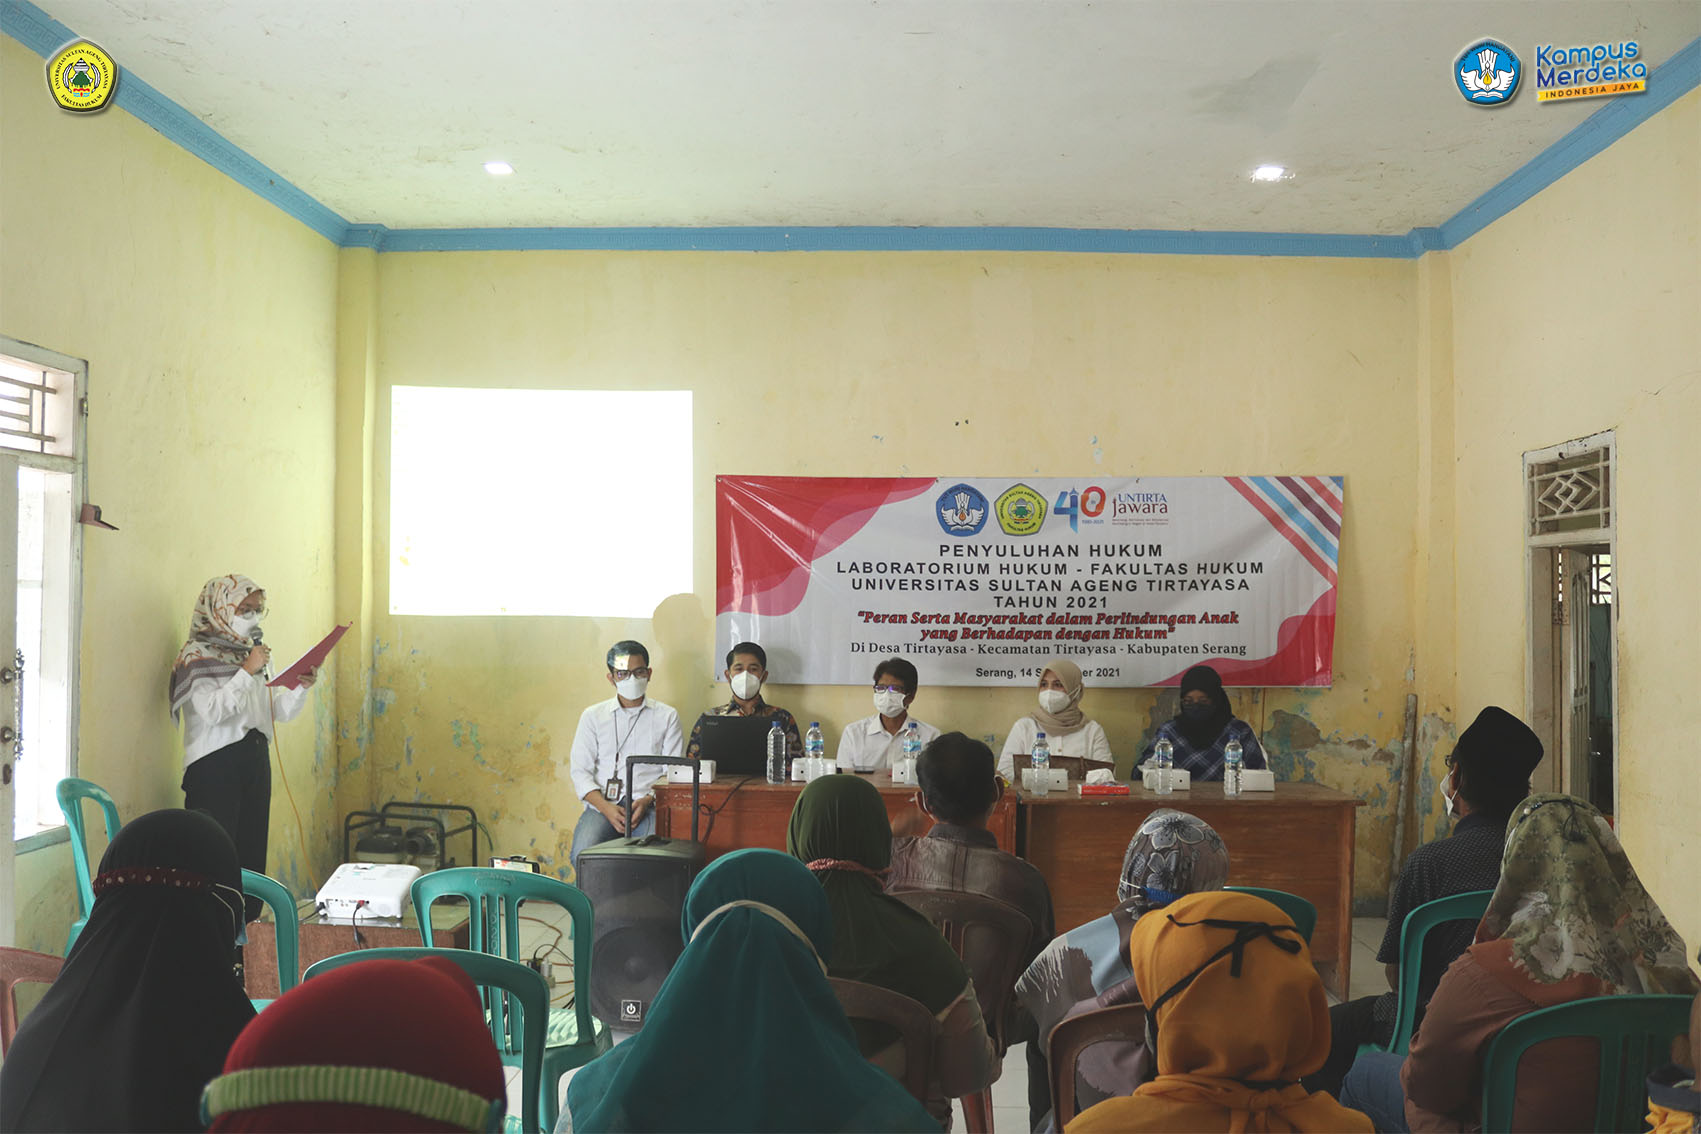 Laboratorium Fakultas Hukum Untirta adakan Penyuluhan Hukum Di Desa Tirtayasa